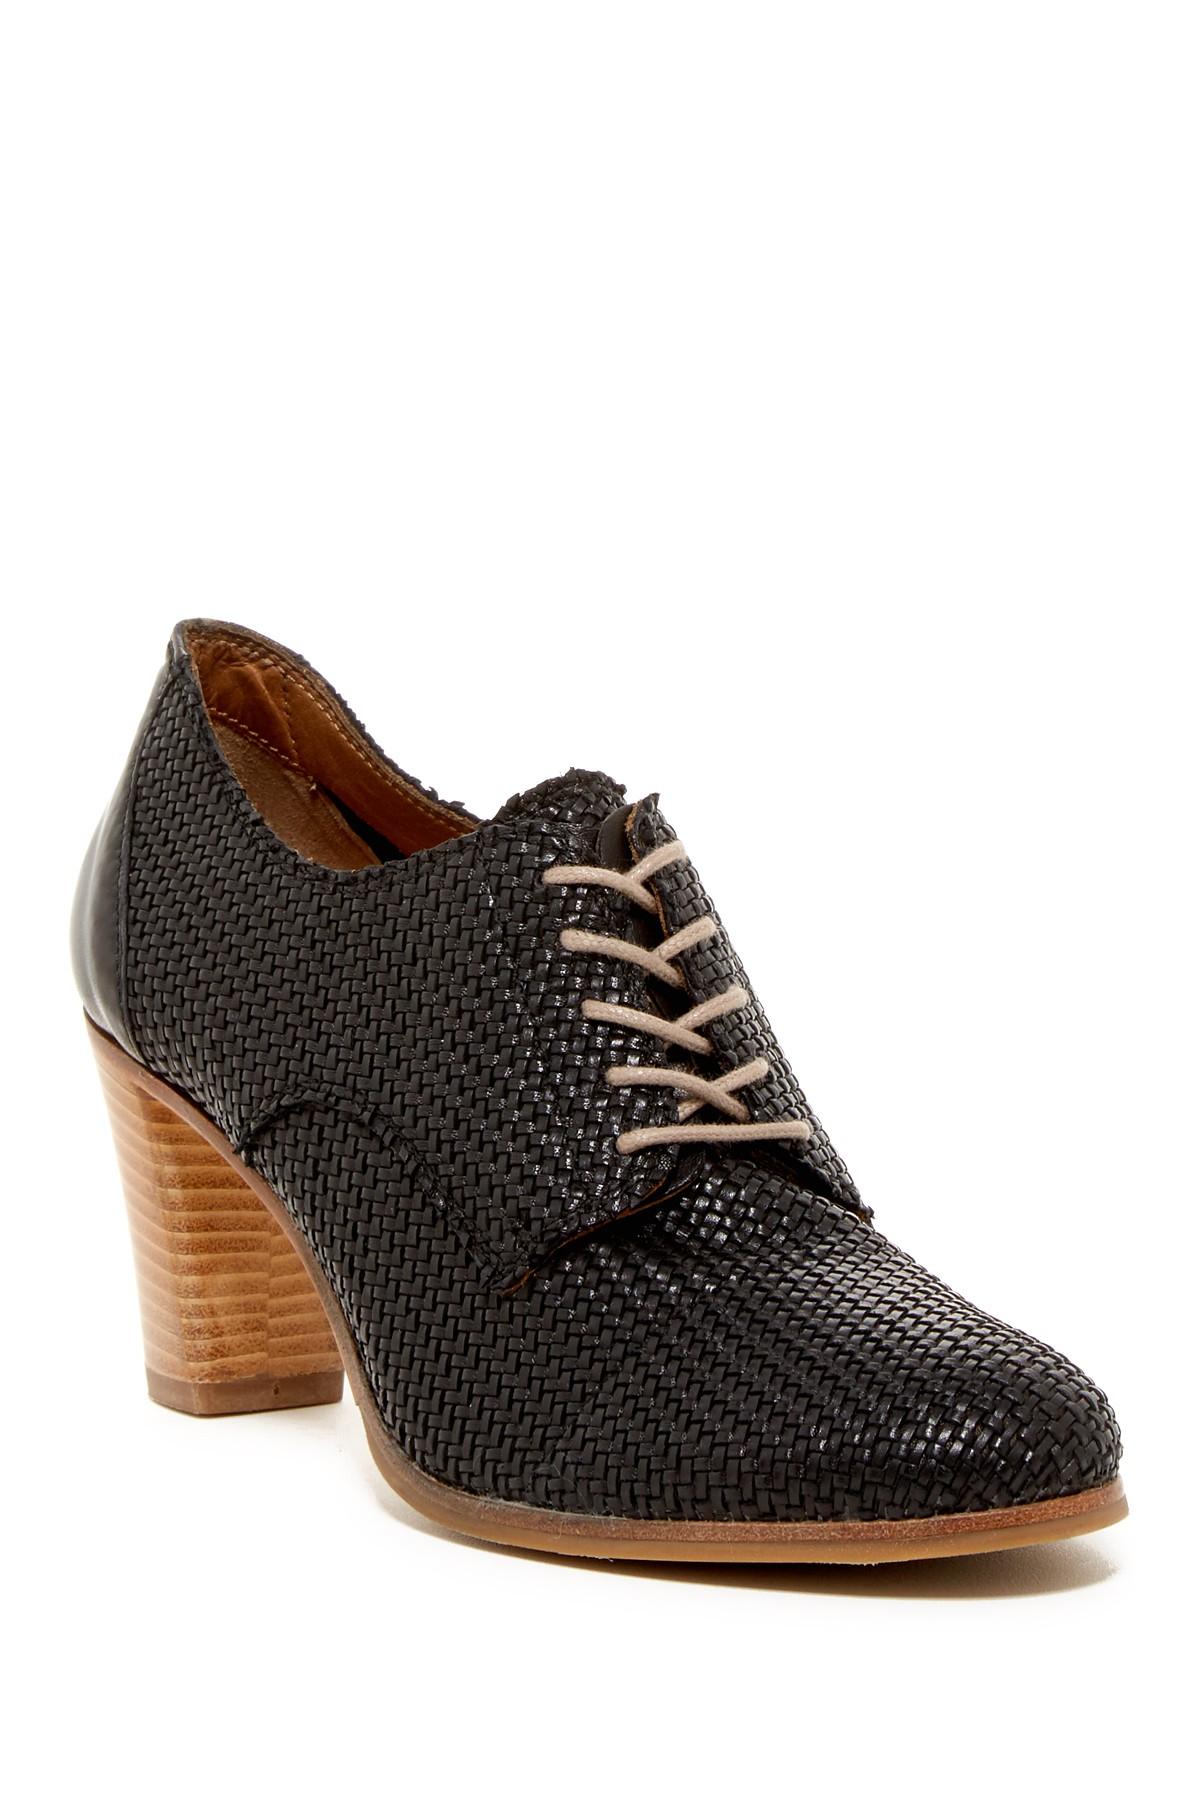 Celine Oxford Shoes Heel